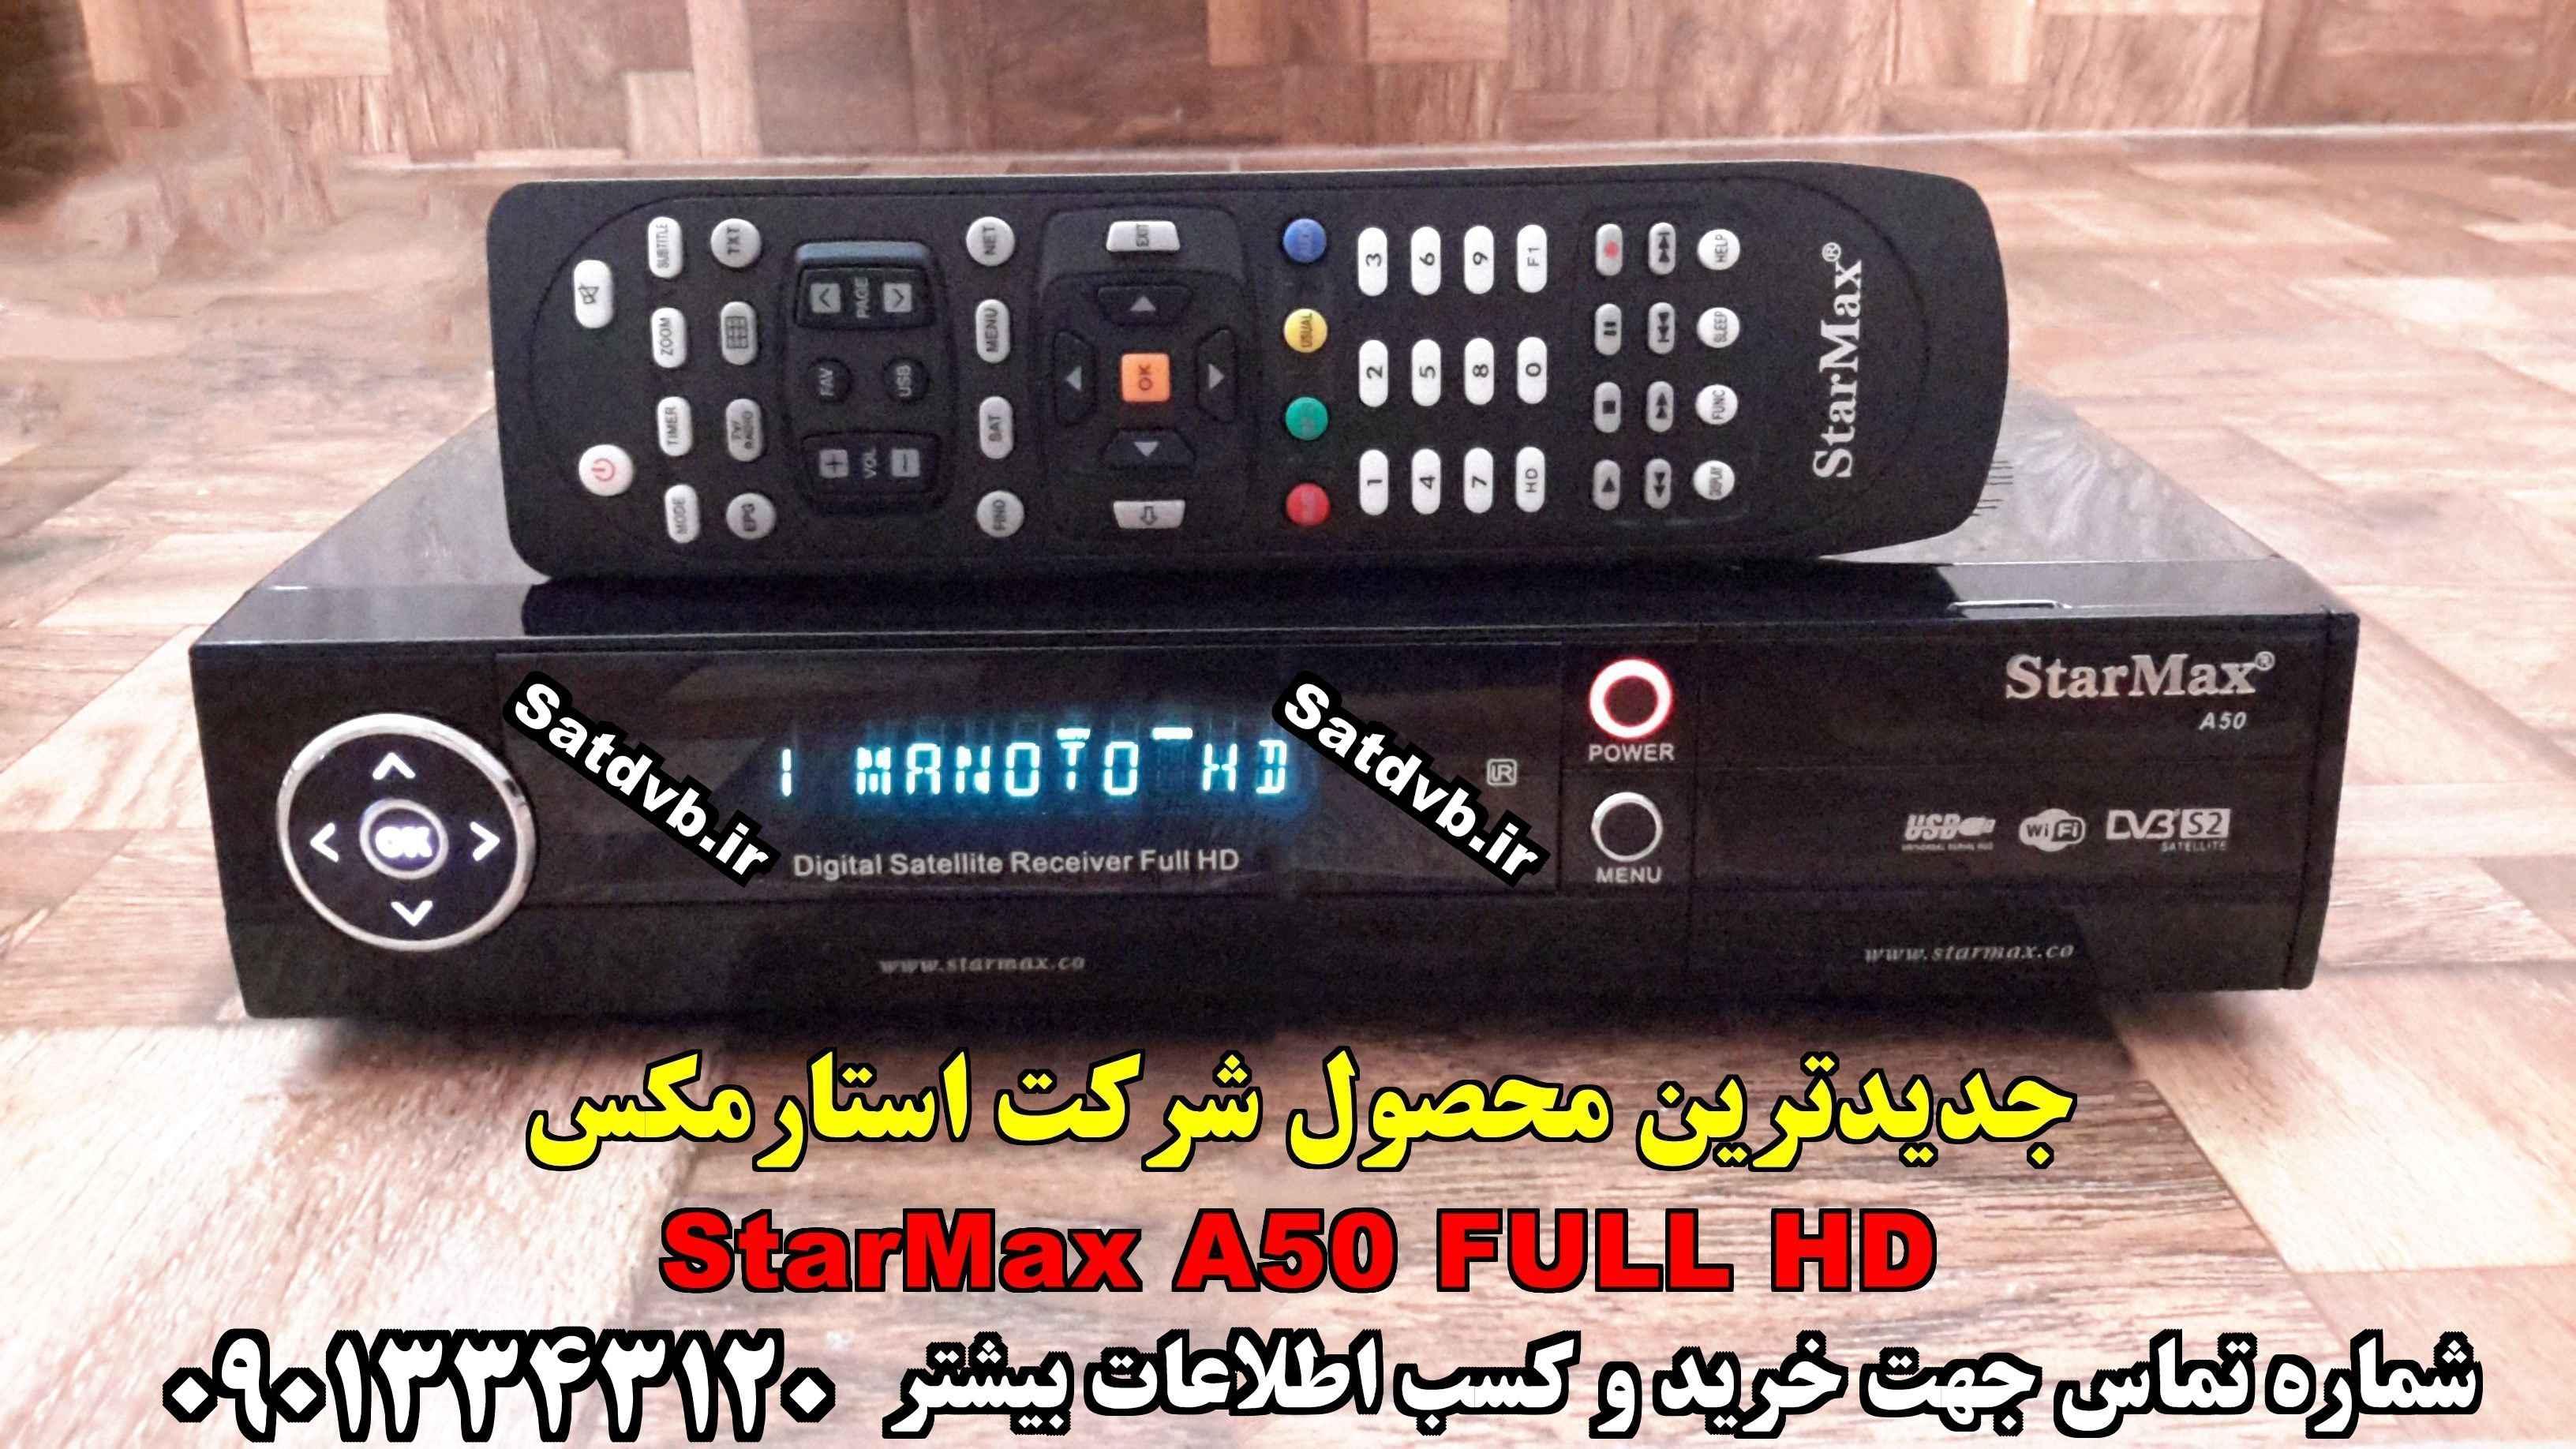 http://s9.picofile.com/file/8273002868/3.jpg